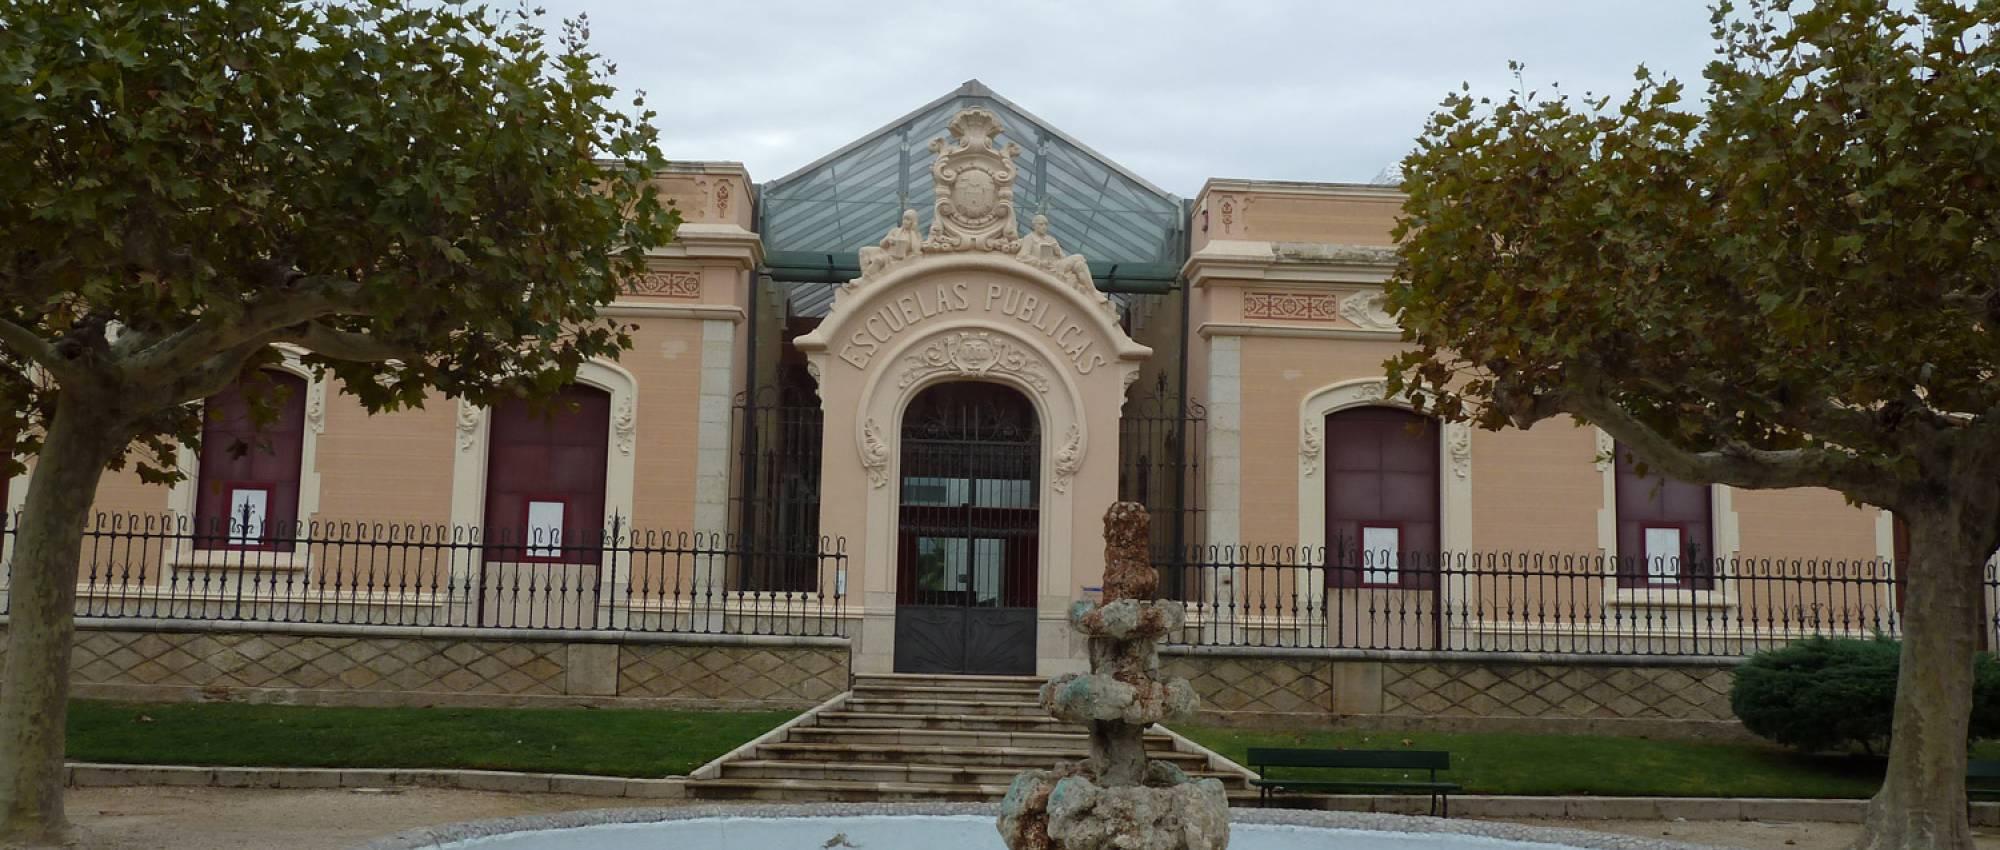 Antiguas Escuelas Miquel Granell. CC BY-SA 3.0 - Deosringas / Wikimedia Commons